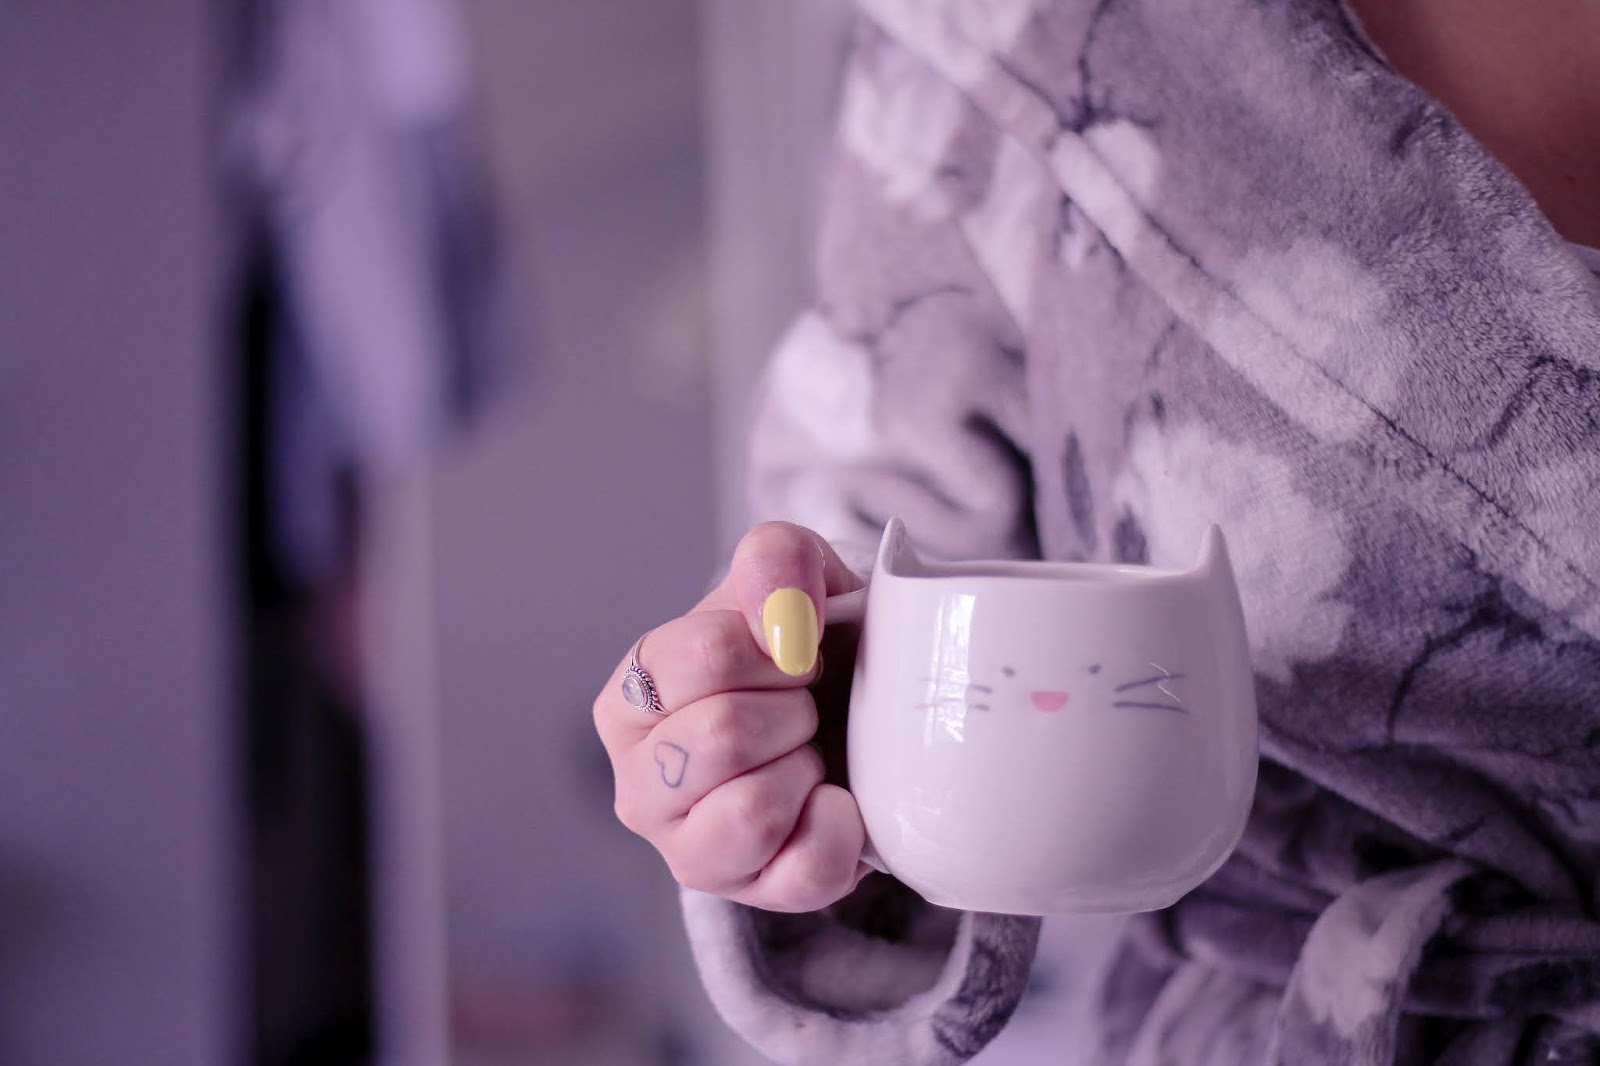 Medium close up shot of a girl in a grey robe holding a white cat mug